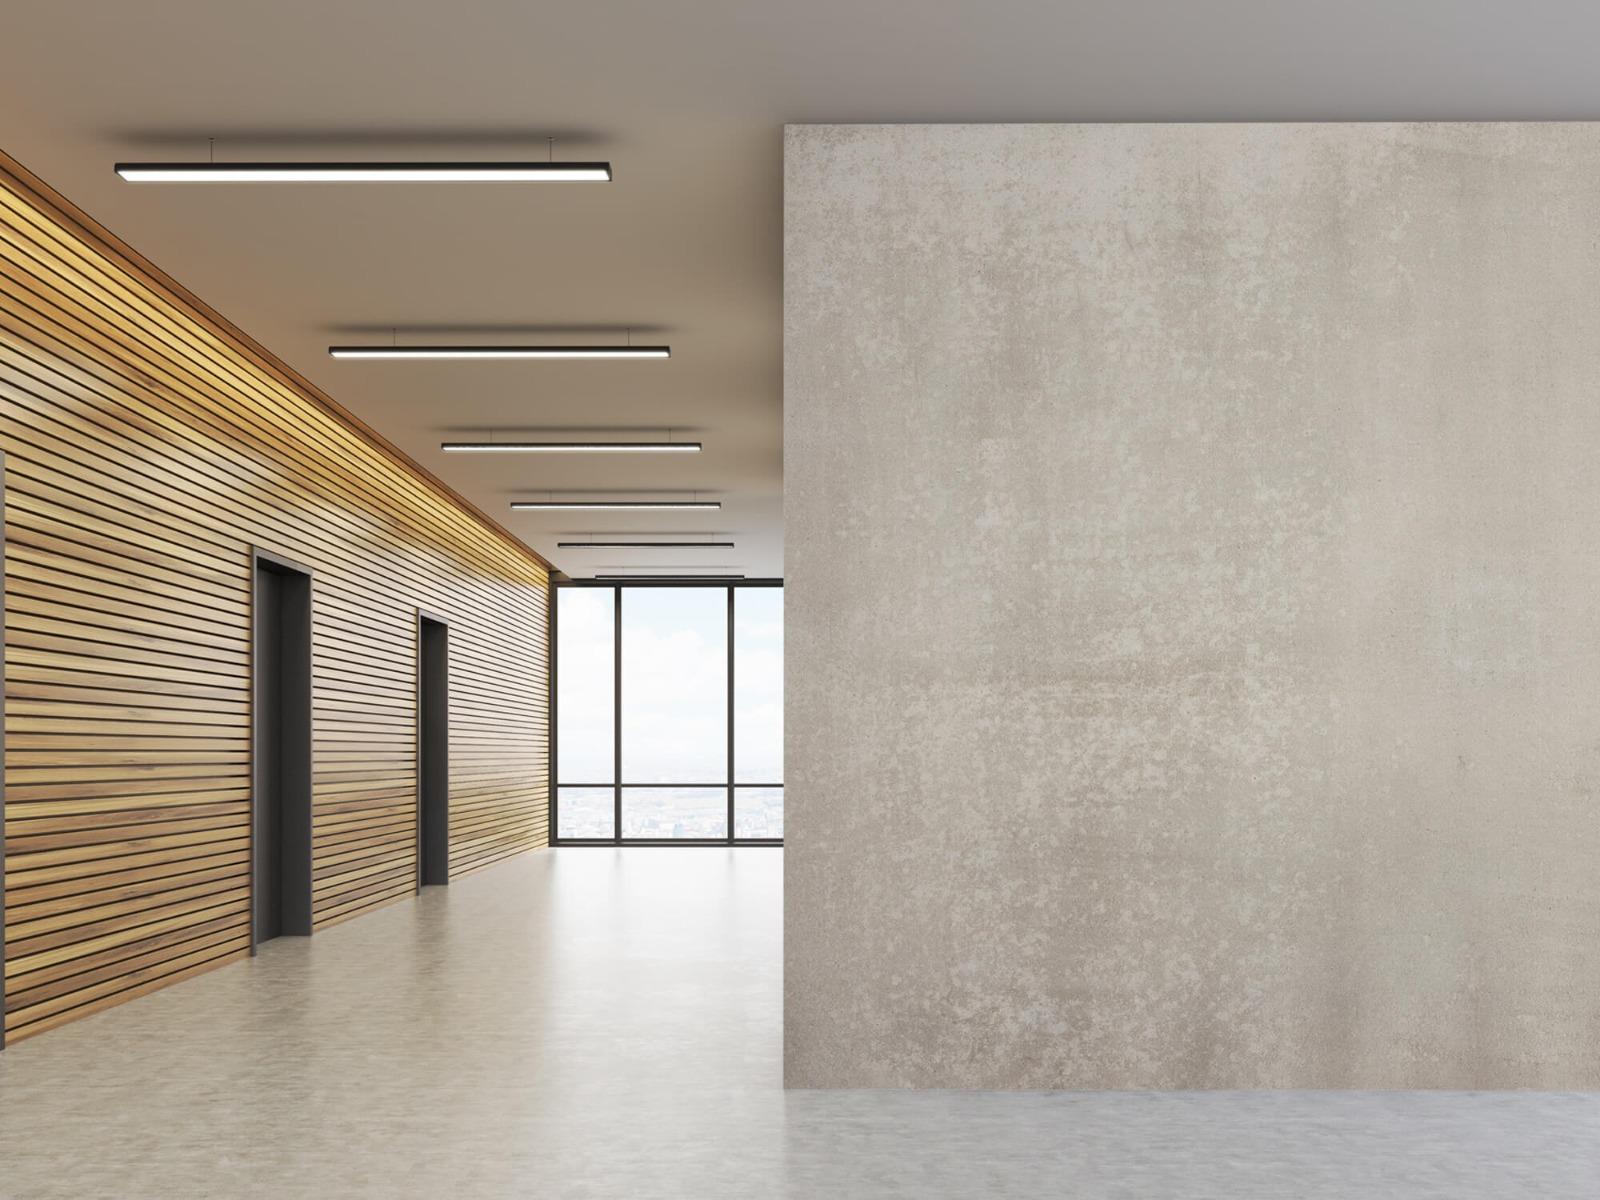 Betonlook behang - Taupe beton - Wallexclusive - Woonkamer 8